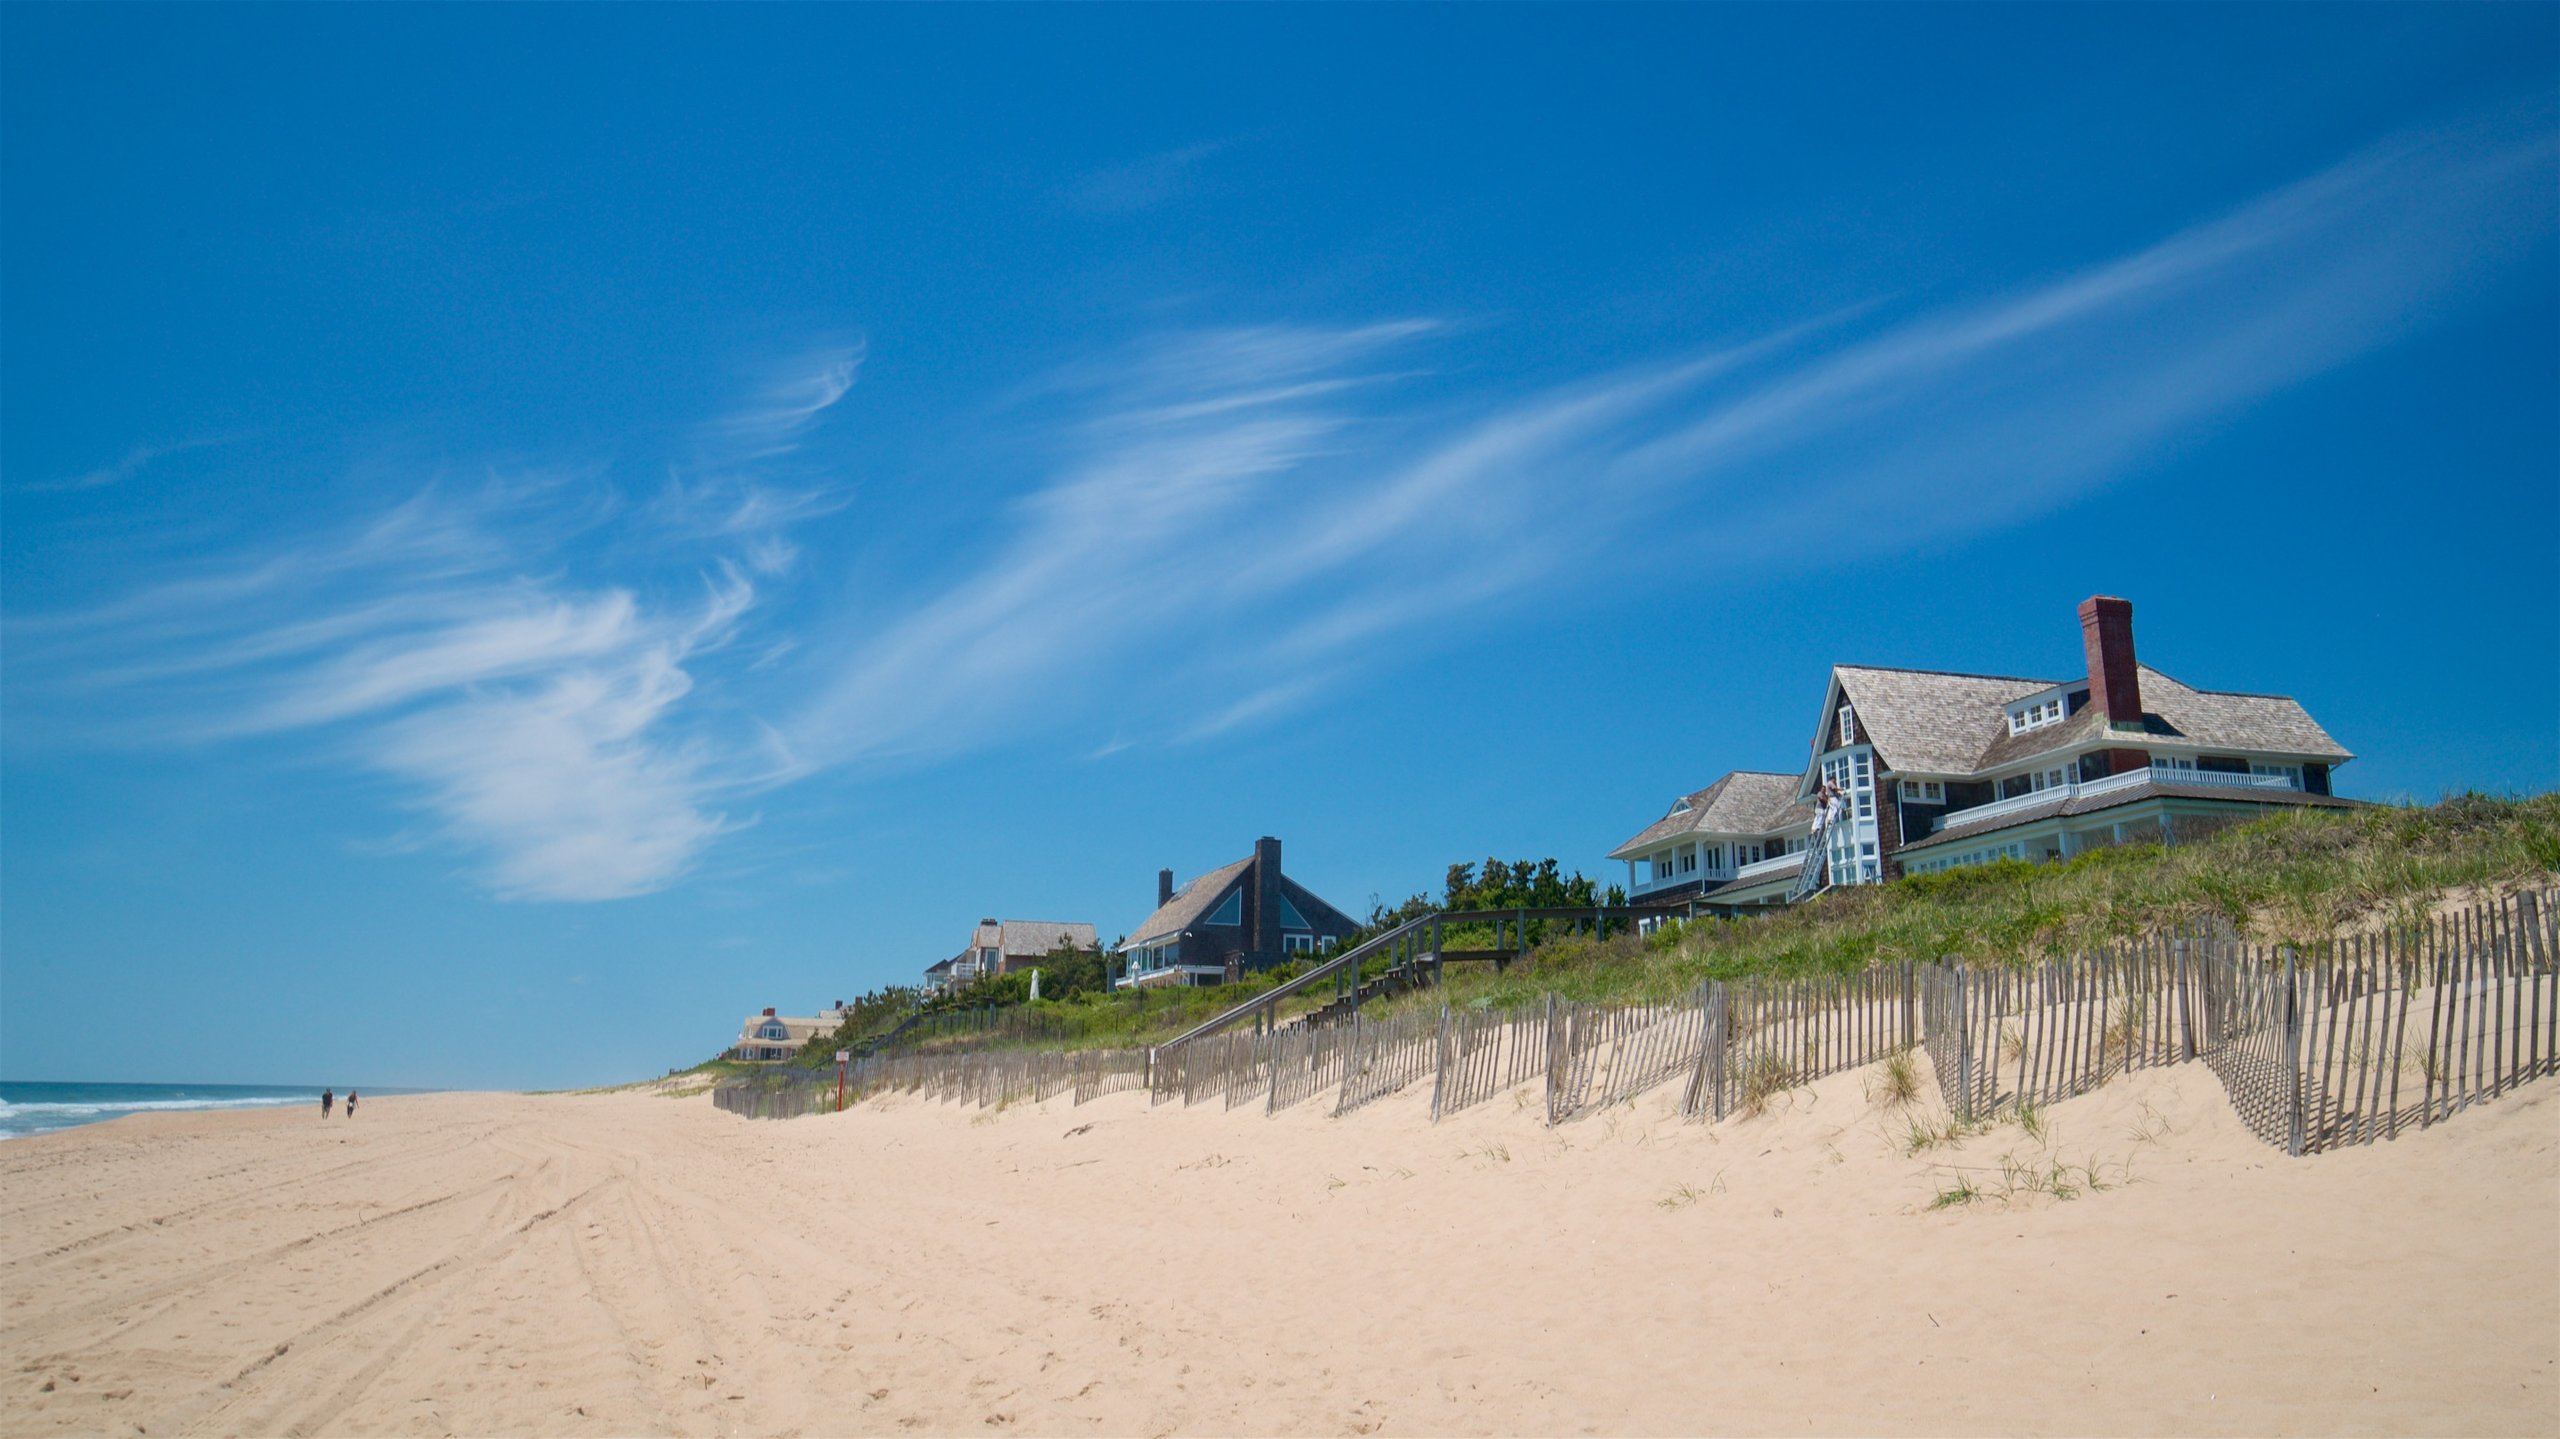 East Hampton Main Beach, East Hampton, New York, United States of America